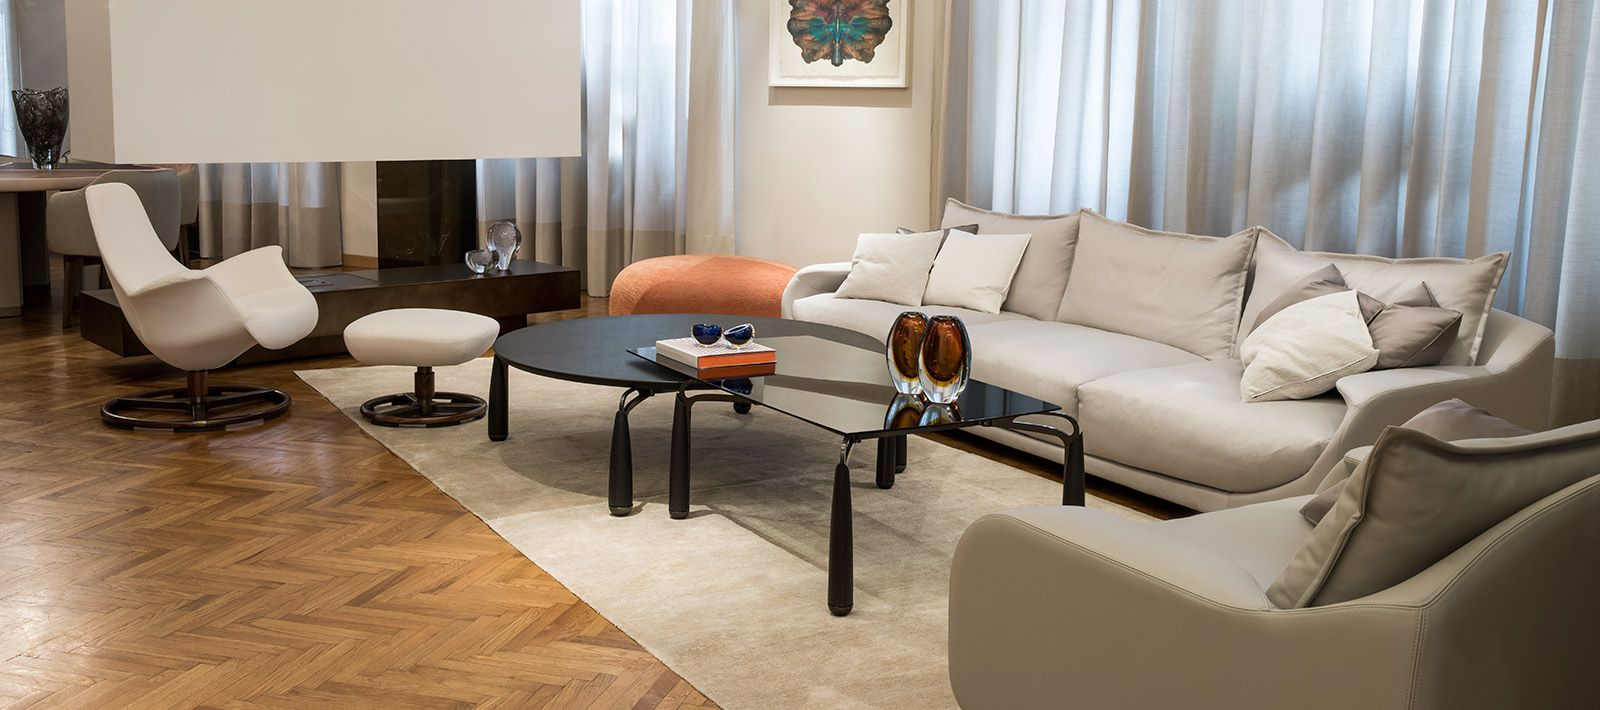 Tilt Sedie e poltroncine Living room sofa, Furniture